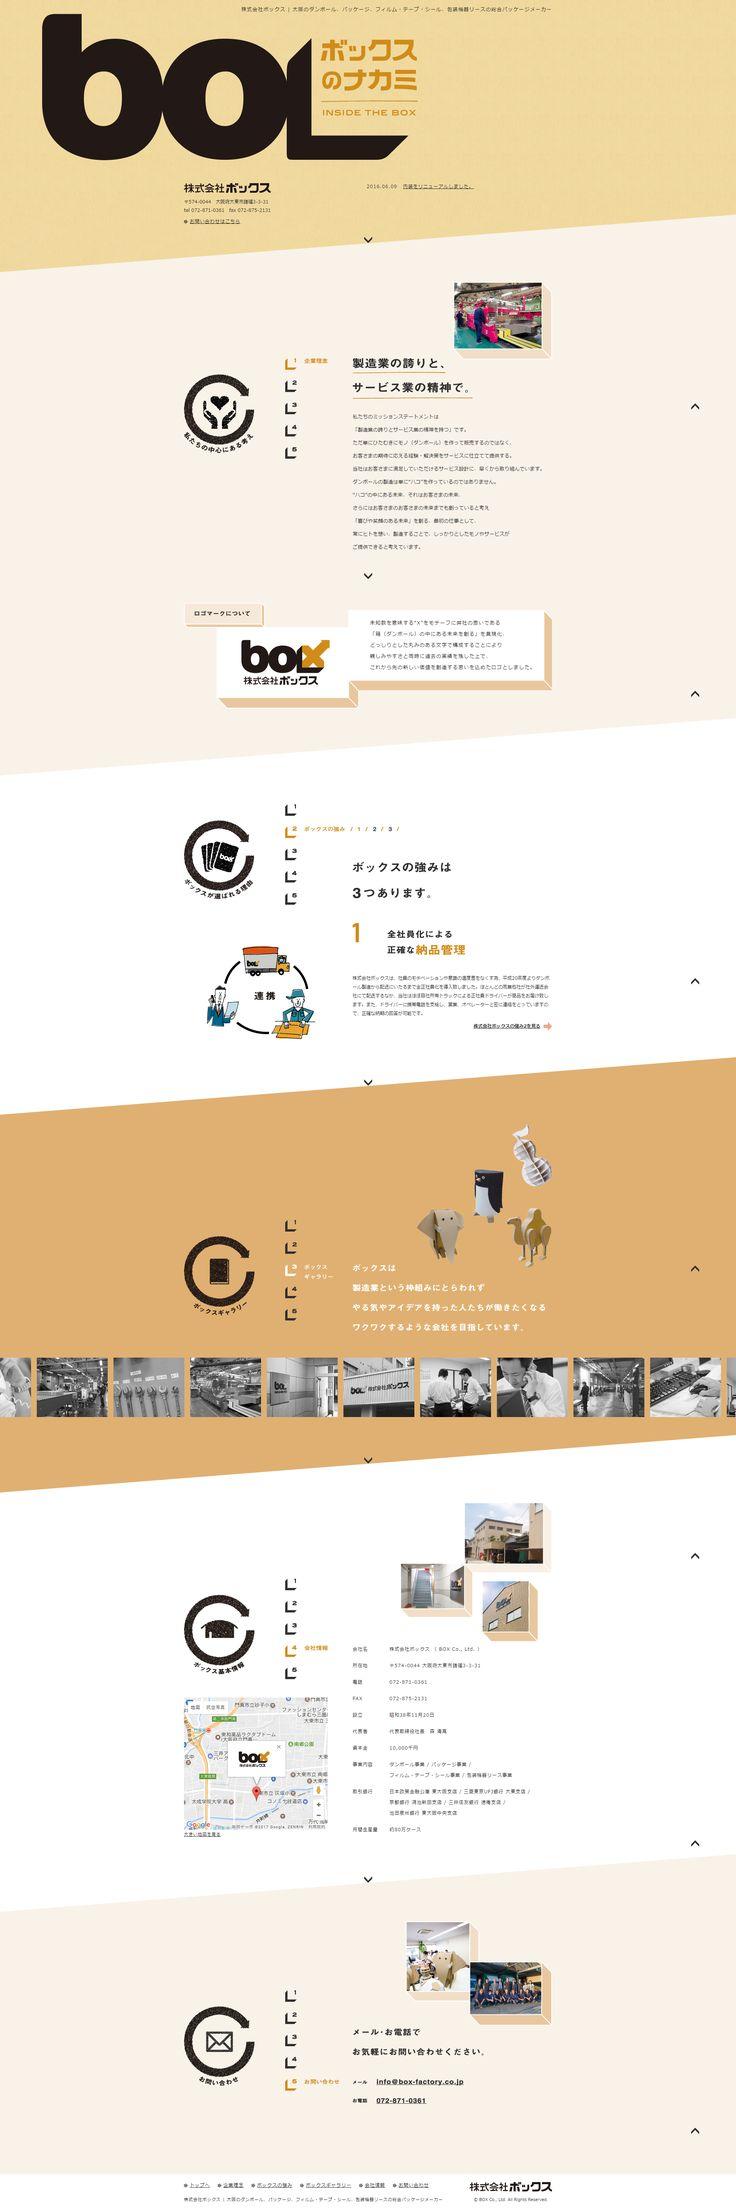 box-factory